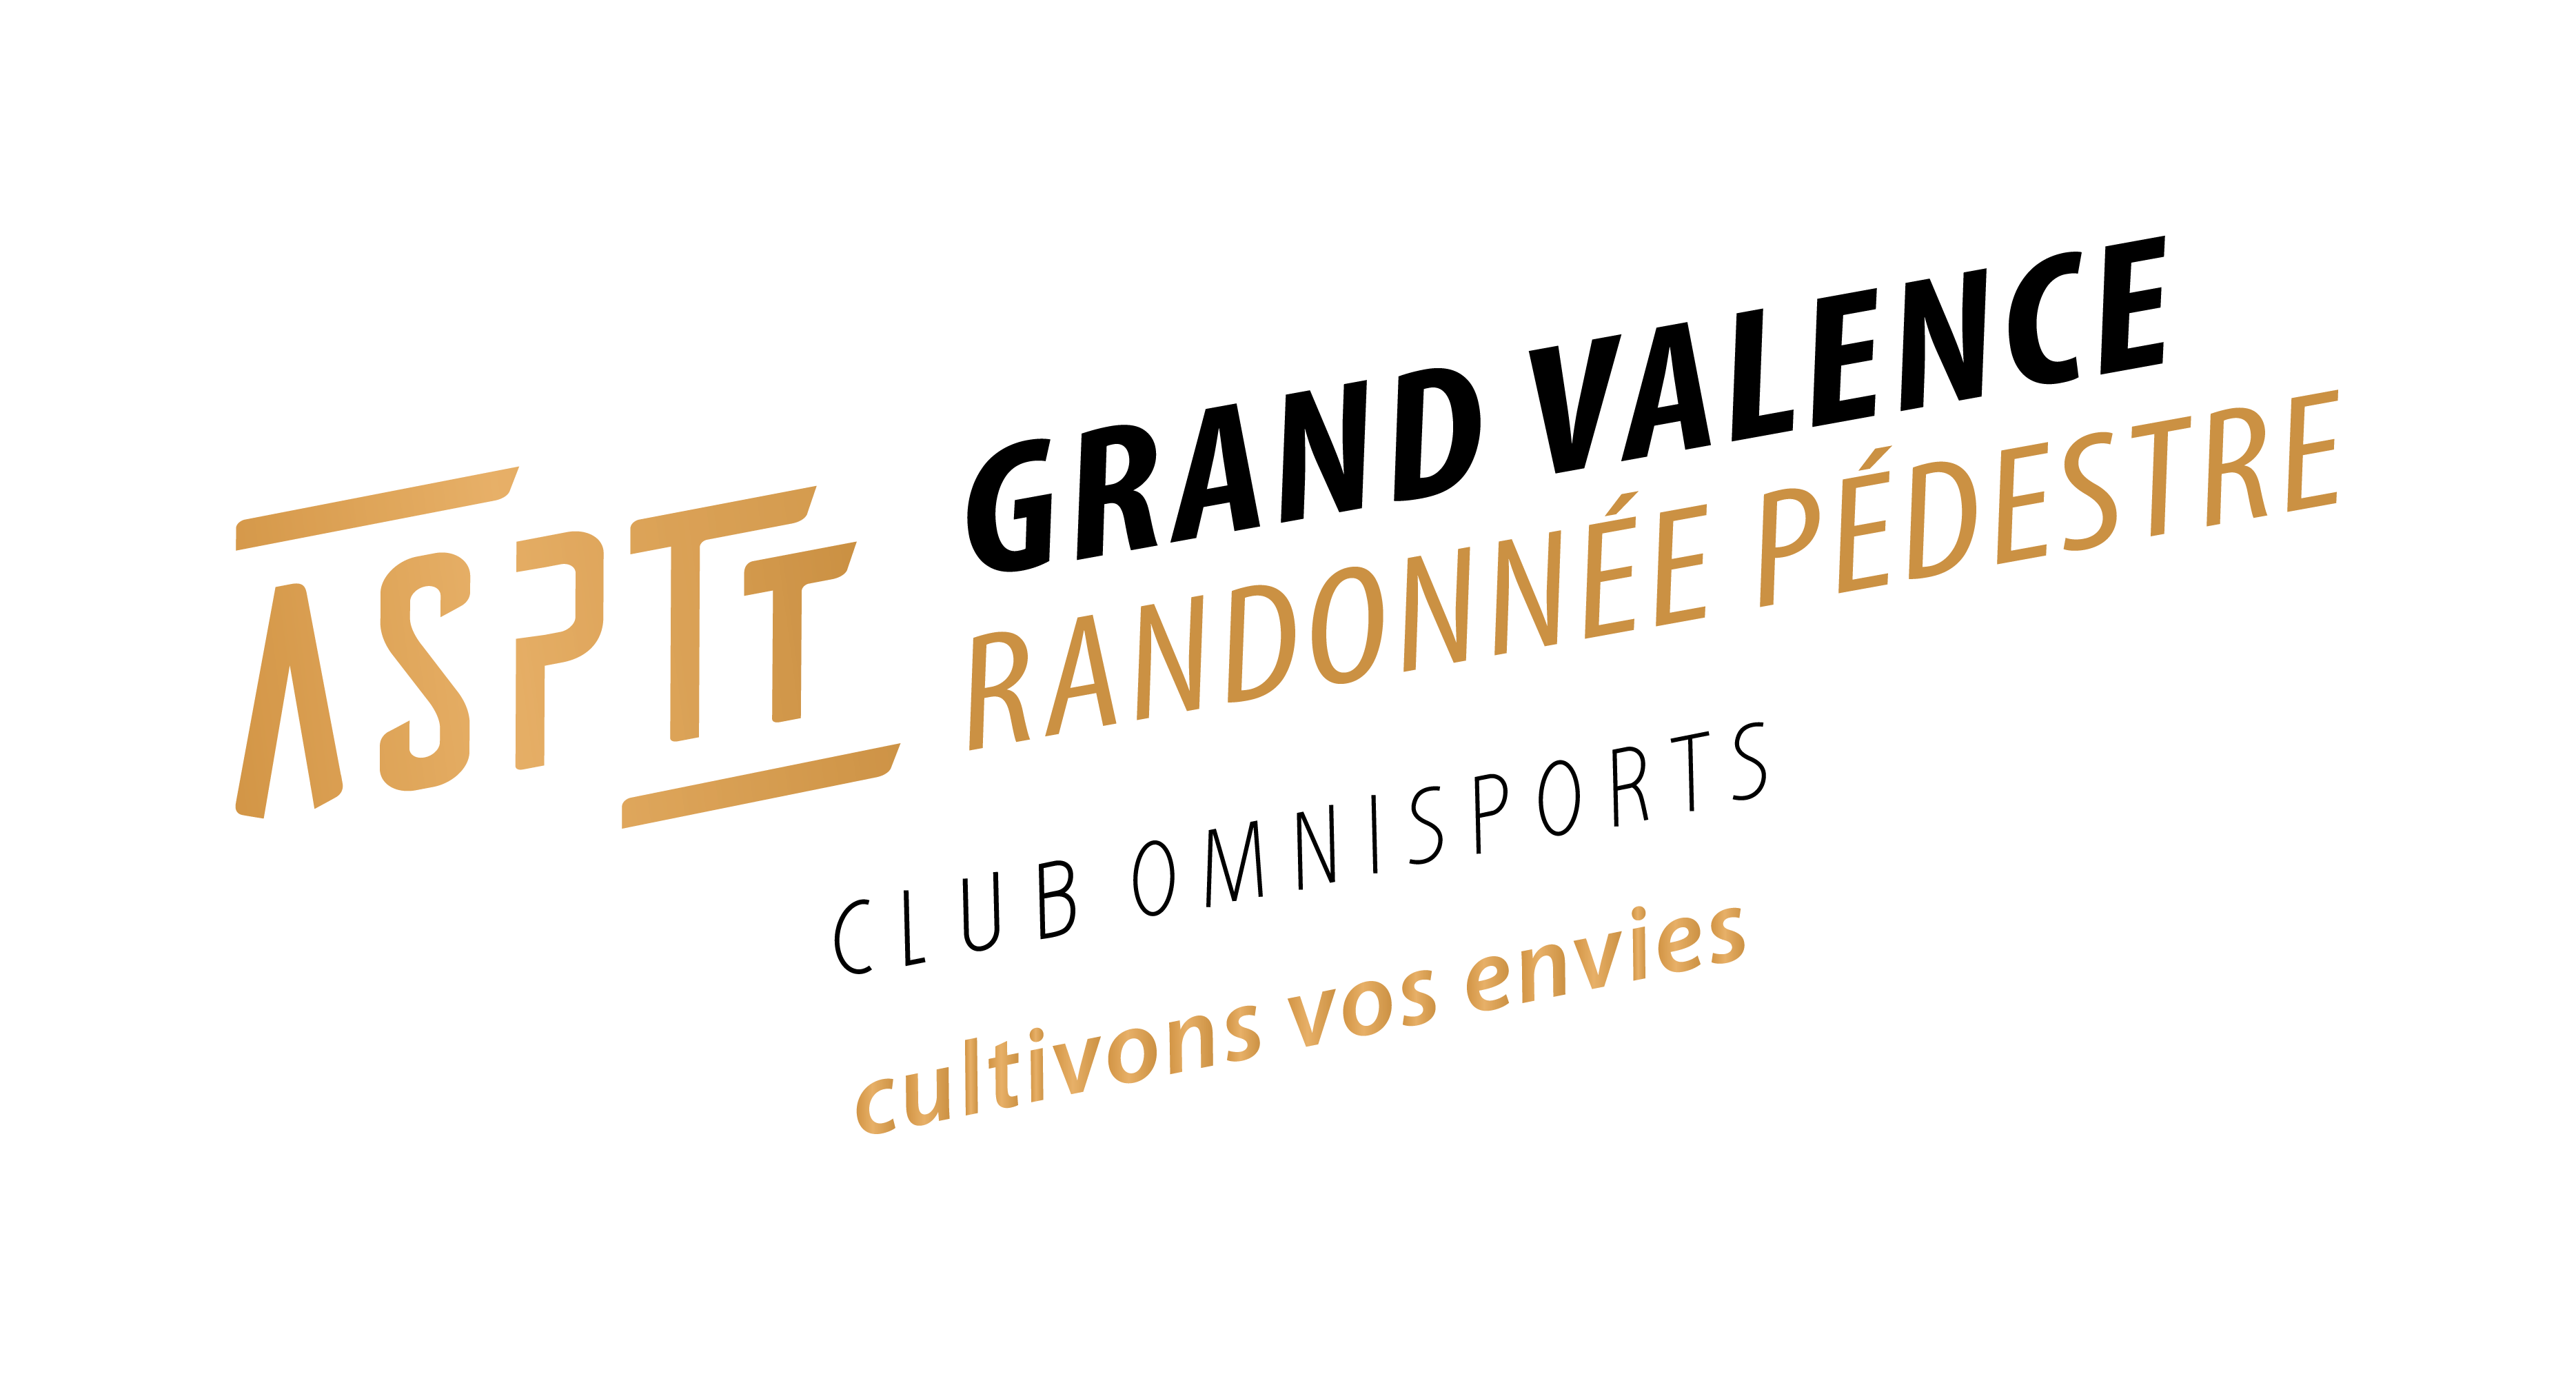 RANDONNEE PEDESTRE GRAND VALENCE